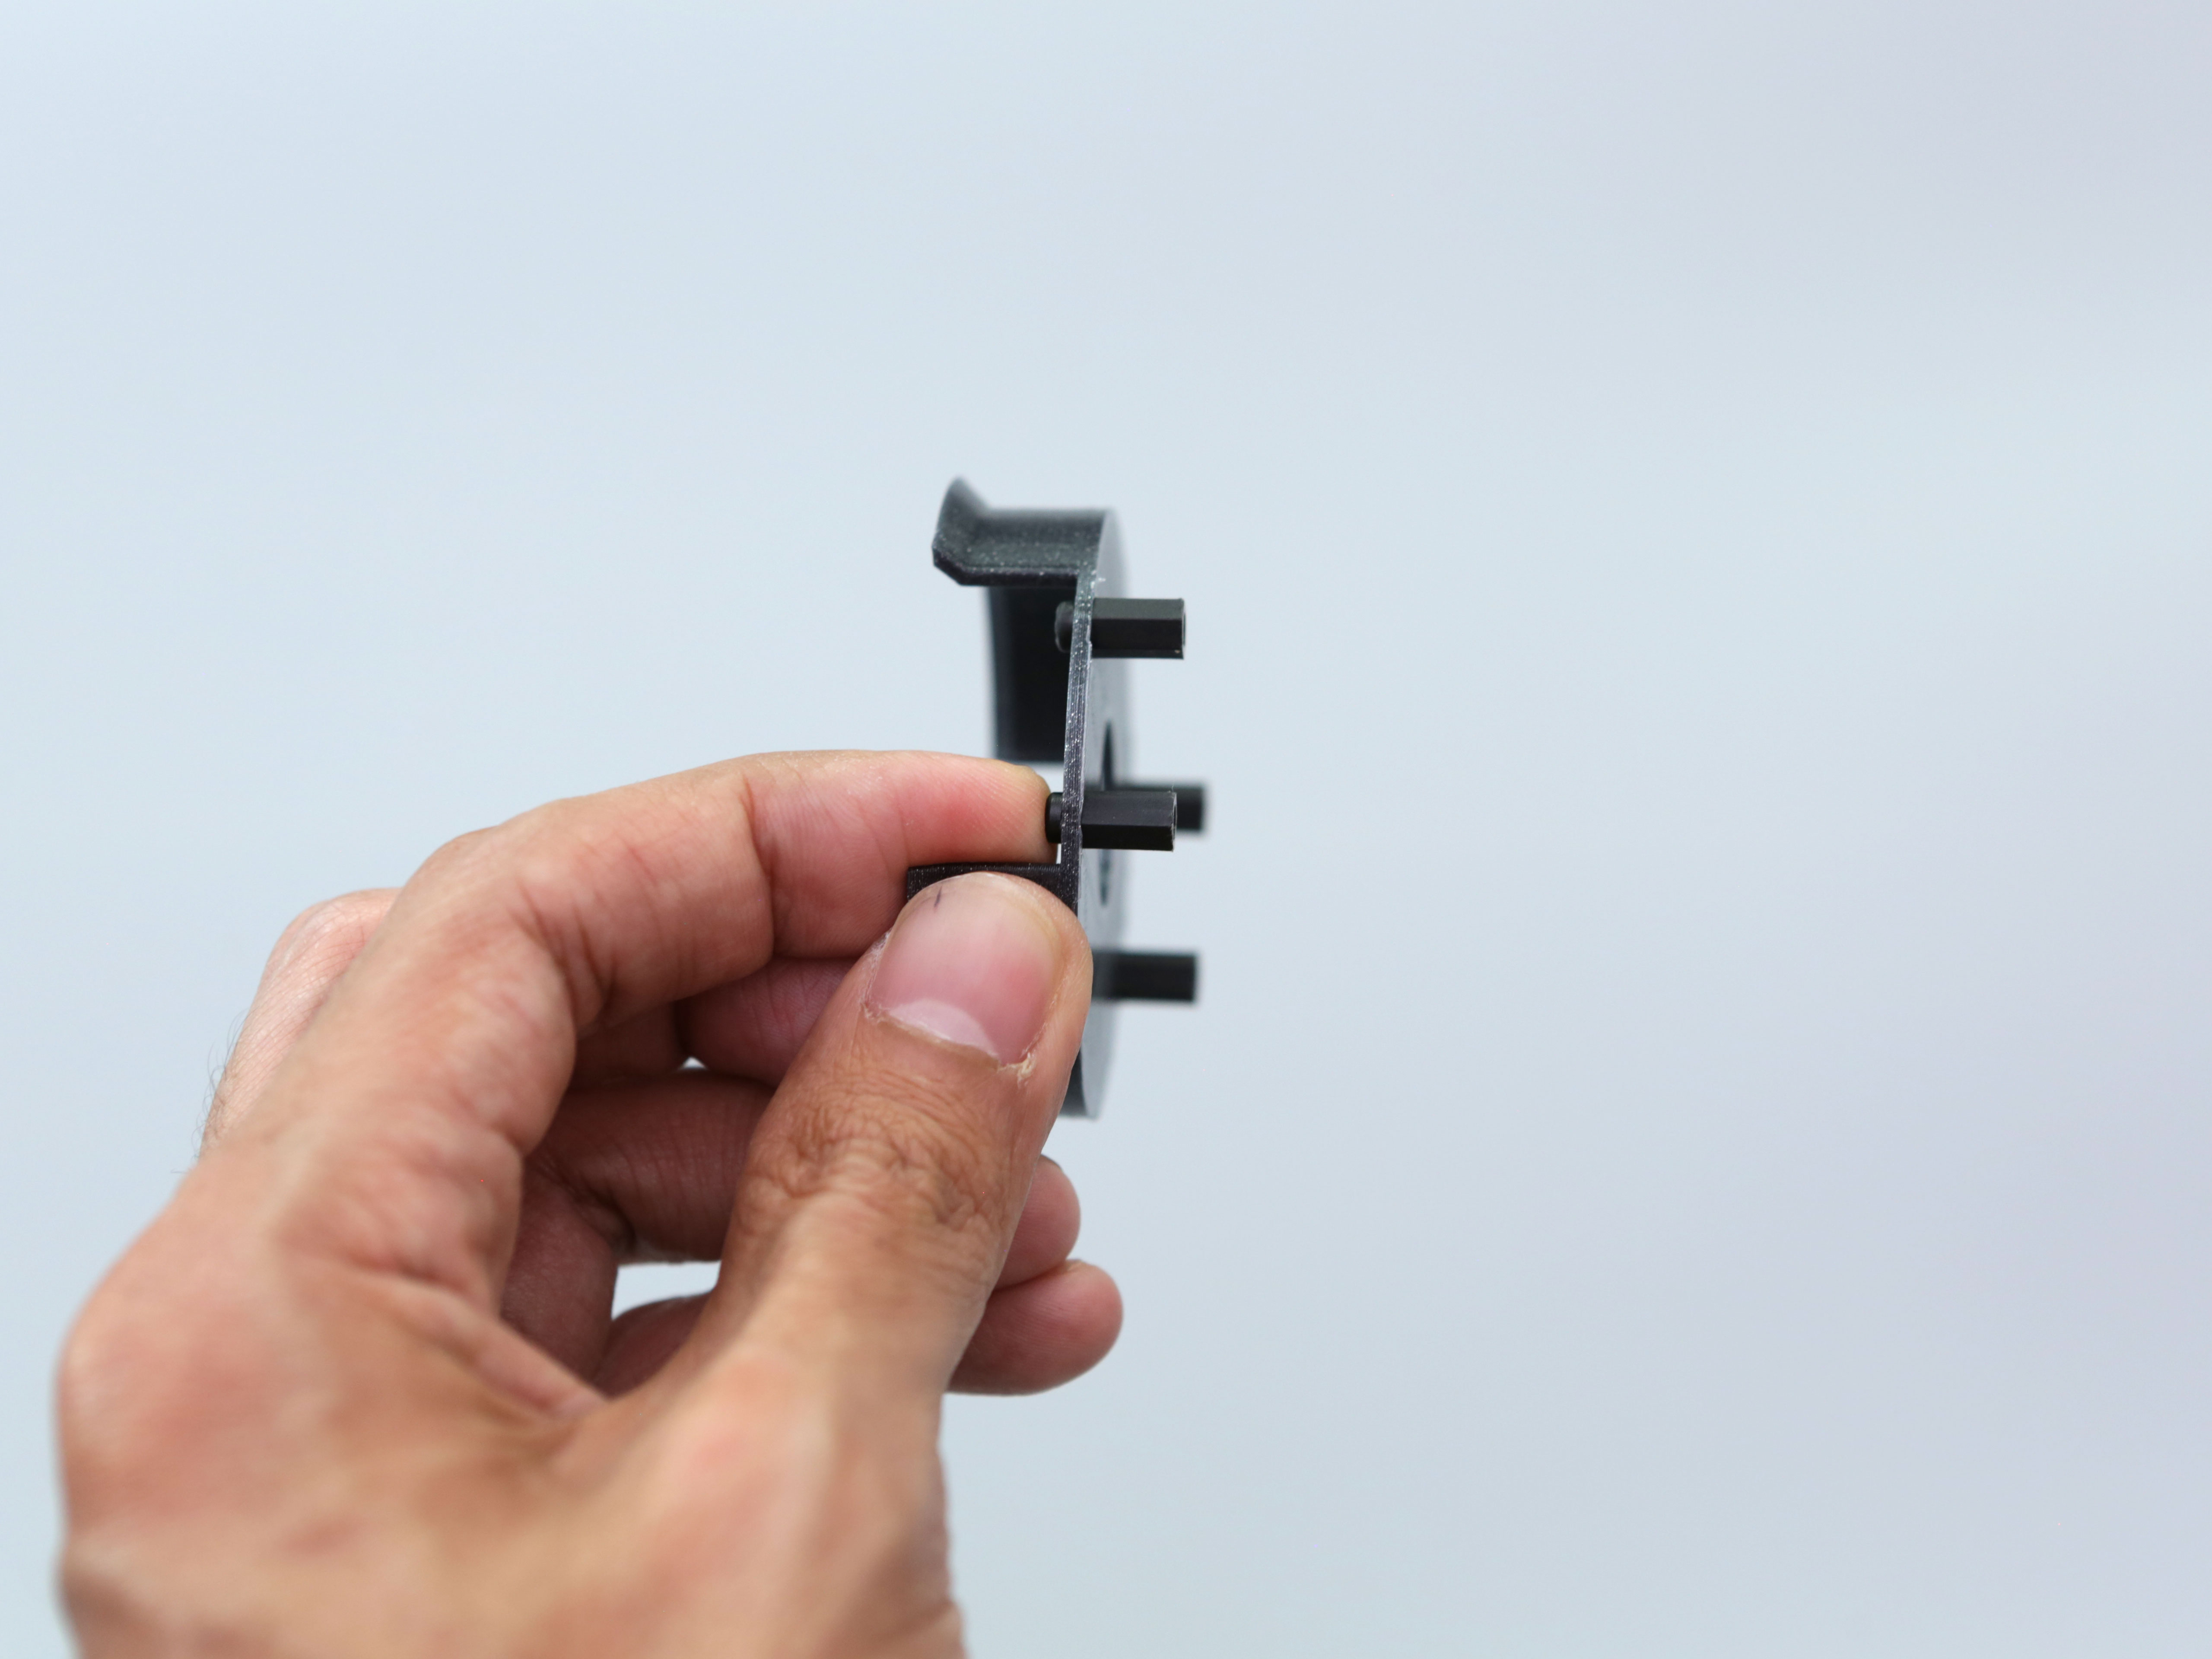 3d_printing_pcb-mount-installing-screws.jpg